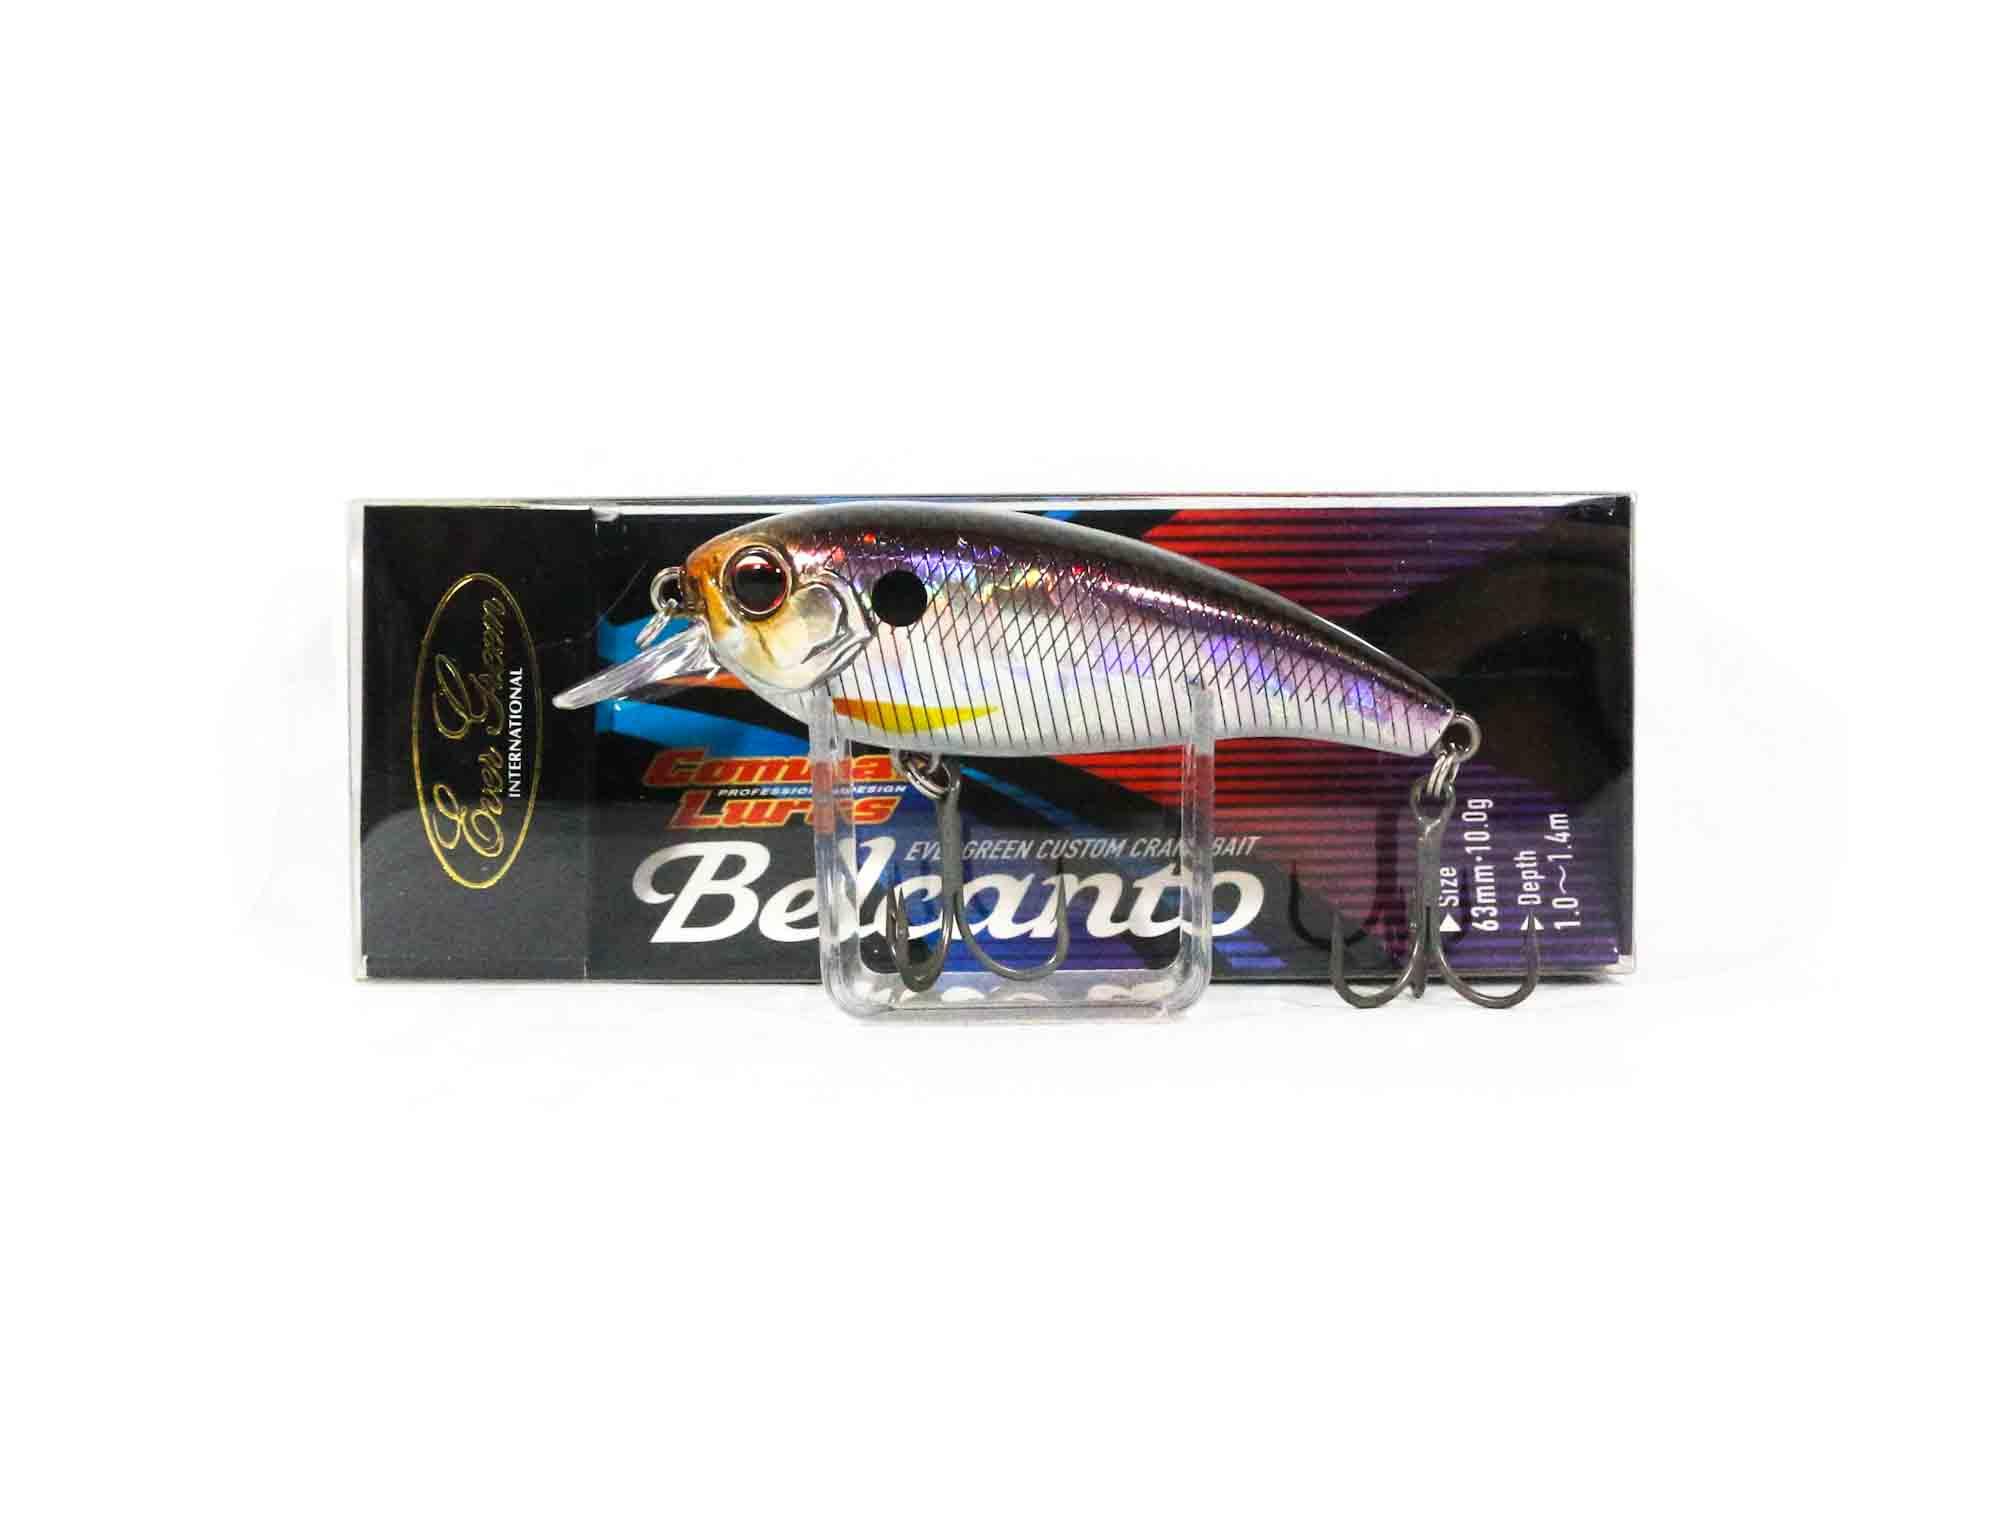 Evergreen Belcanto 63 Floating Lure 209 (3800)